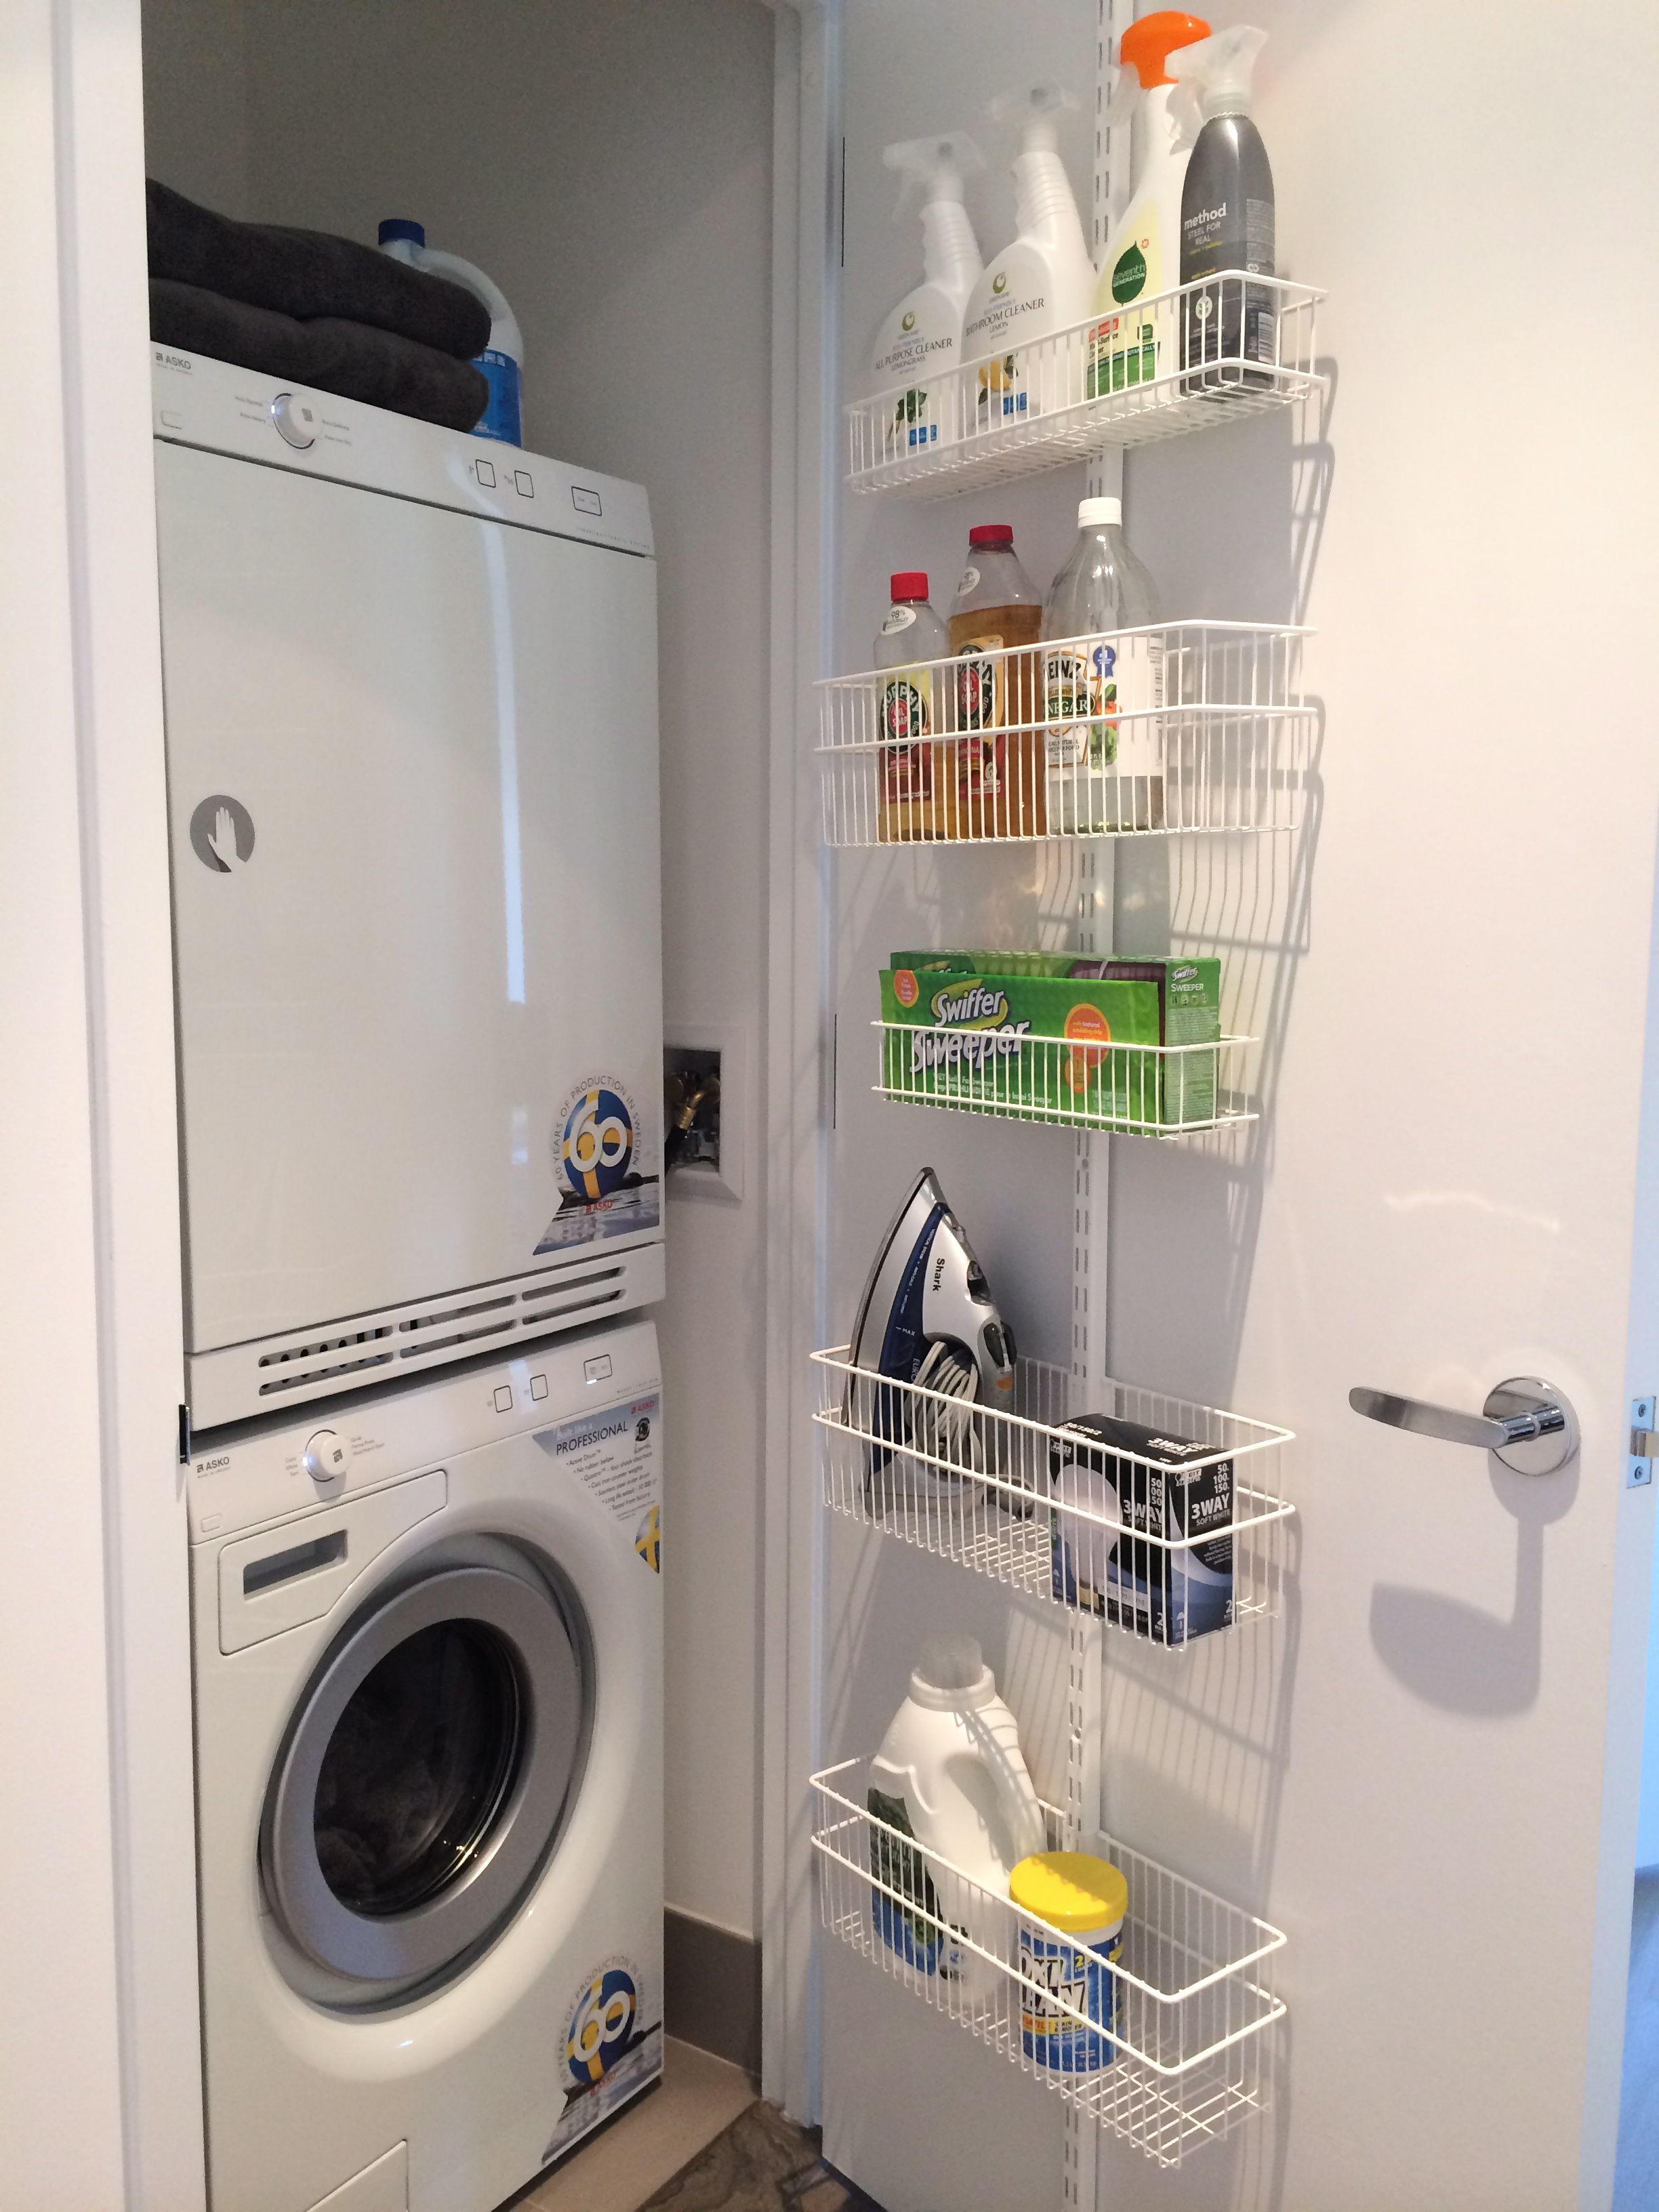 Elfa Door Rack To Create A Cleaning Closet By Laura Cattano Closet Door Storage Small Laundry Closet Laundry Room Organization